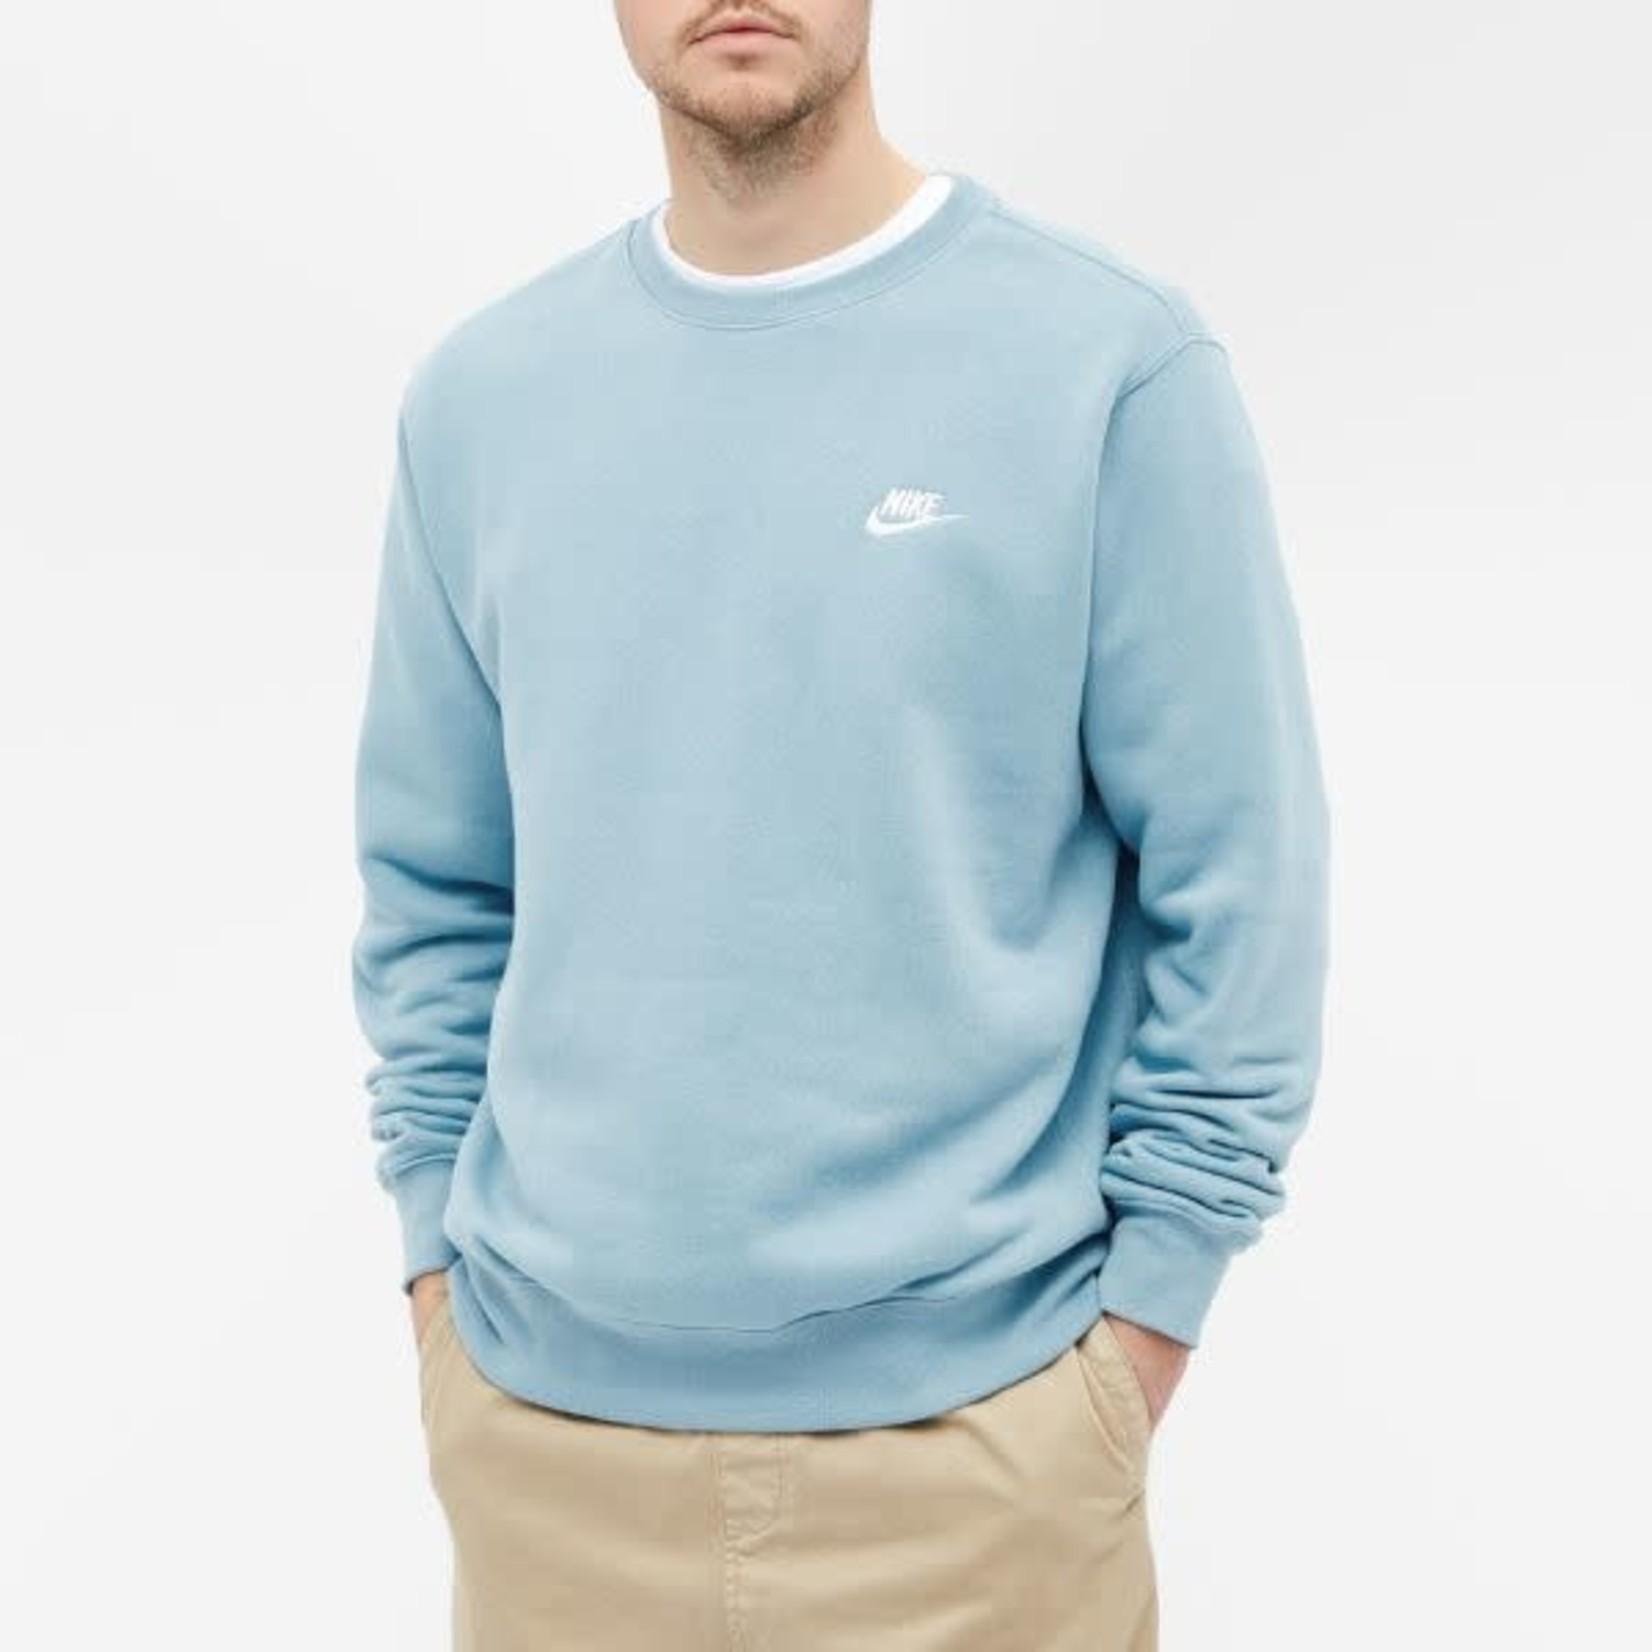 Nike Nike Sweater, Sportswear Club, Mens